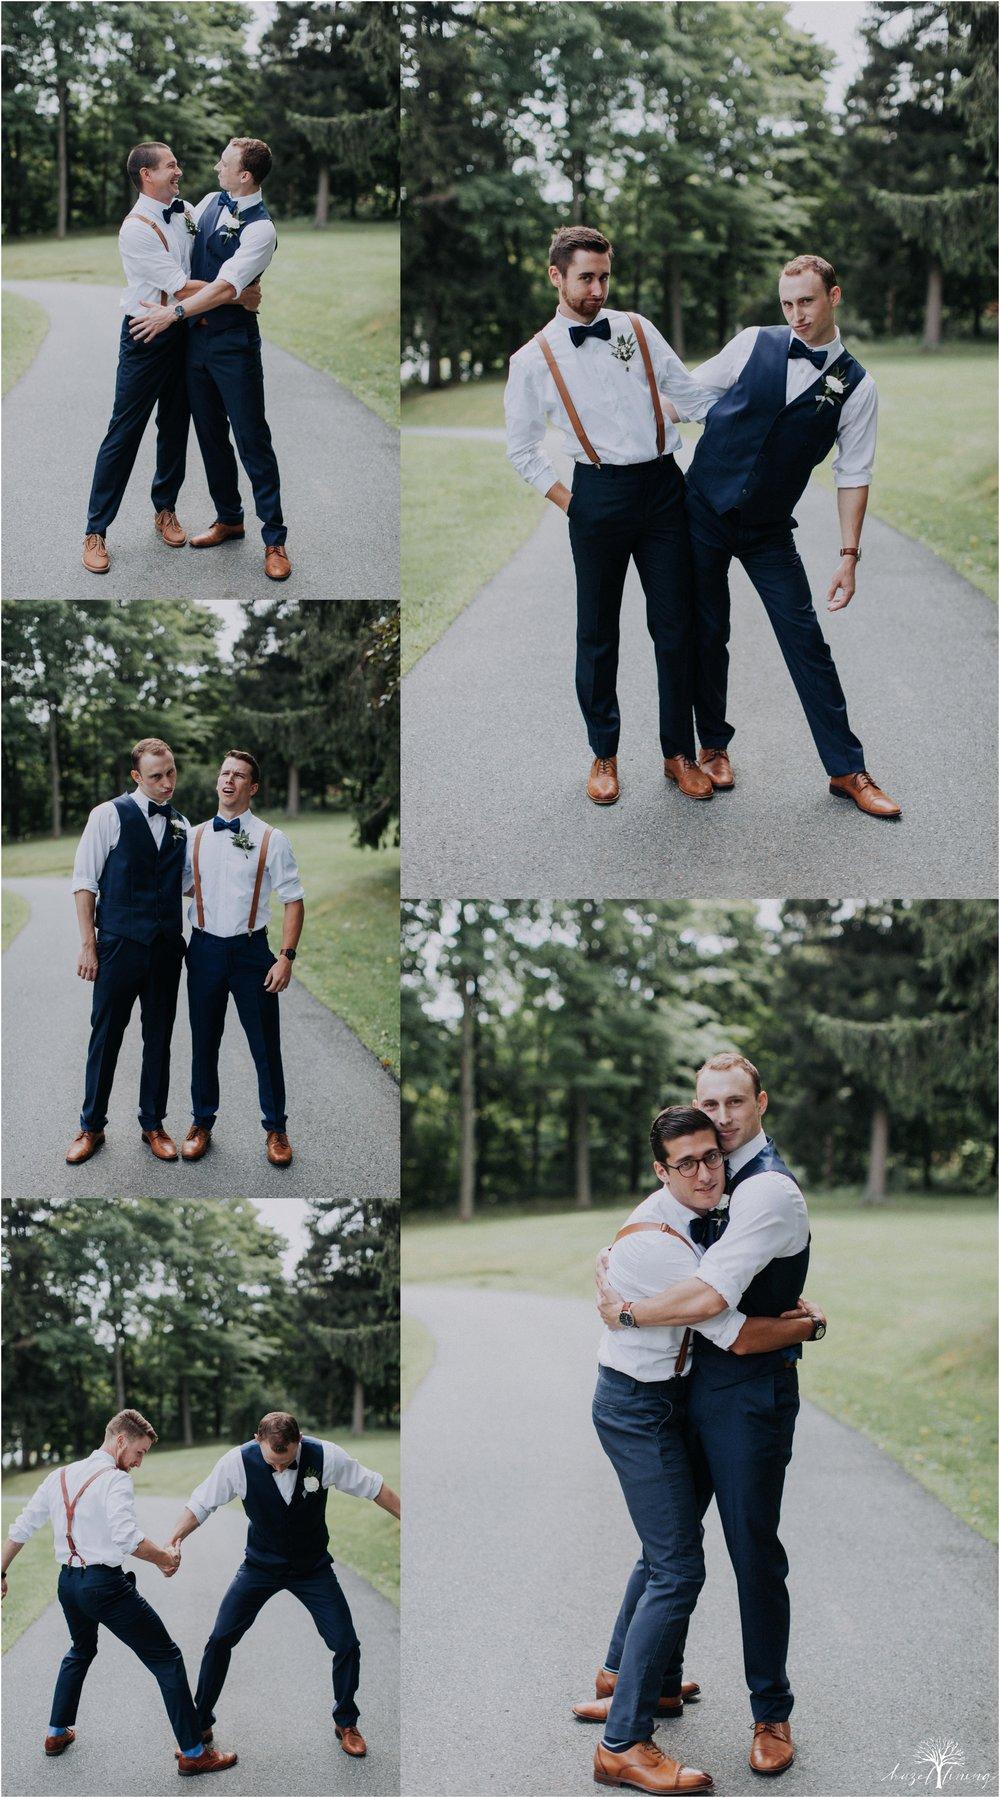 mariah-kreyling-samuel-sherratt-sherrattwiththeworld-peirce-farm-at-witch-hill-boston-massachusetts-wedding-photography-hazel-lining-travel-wedding-elopement-photography_0063.jpg